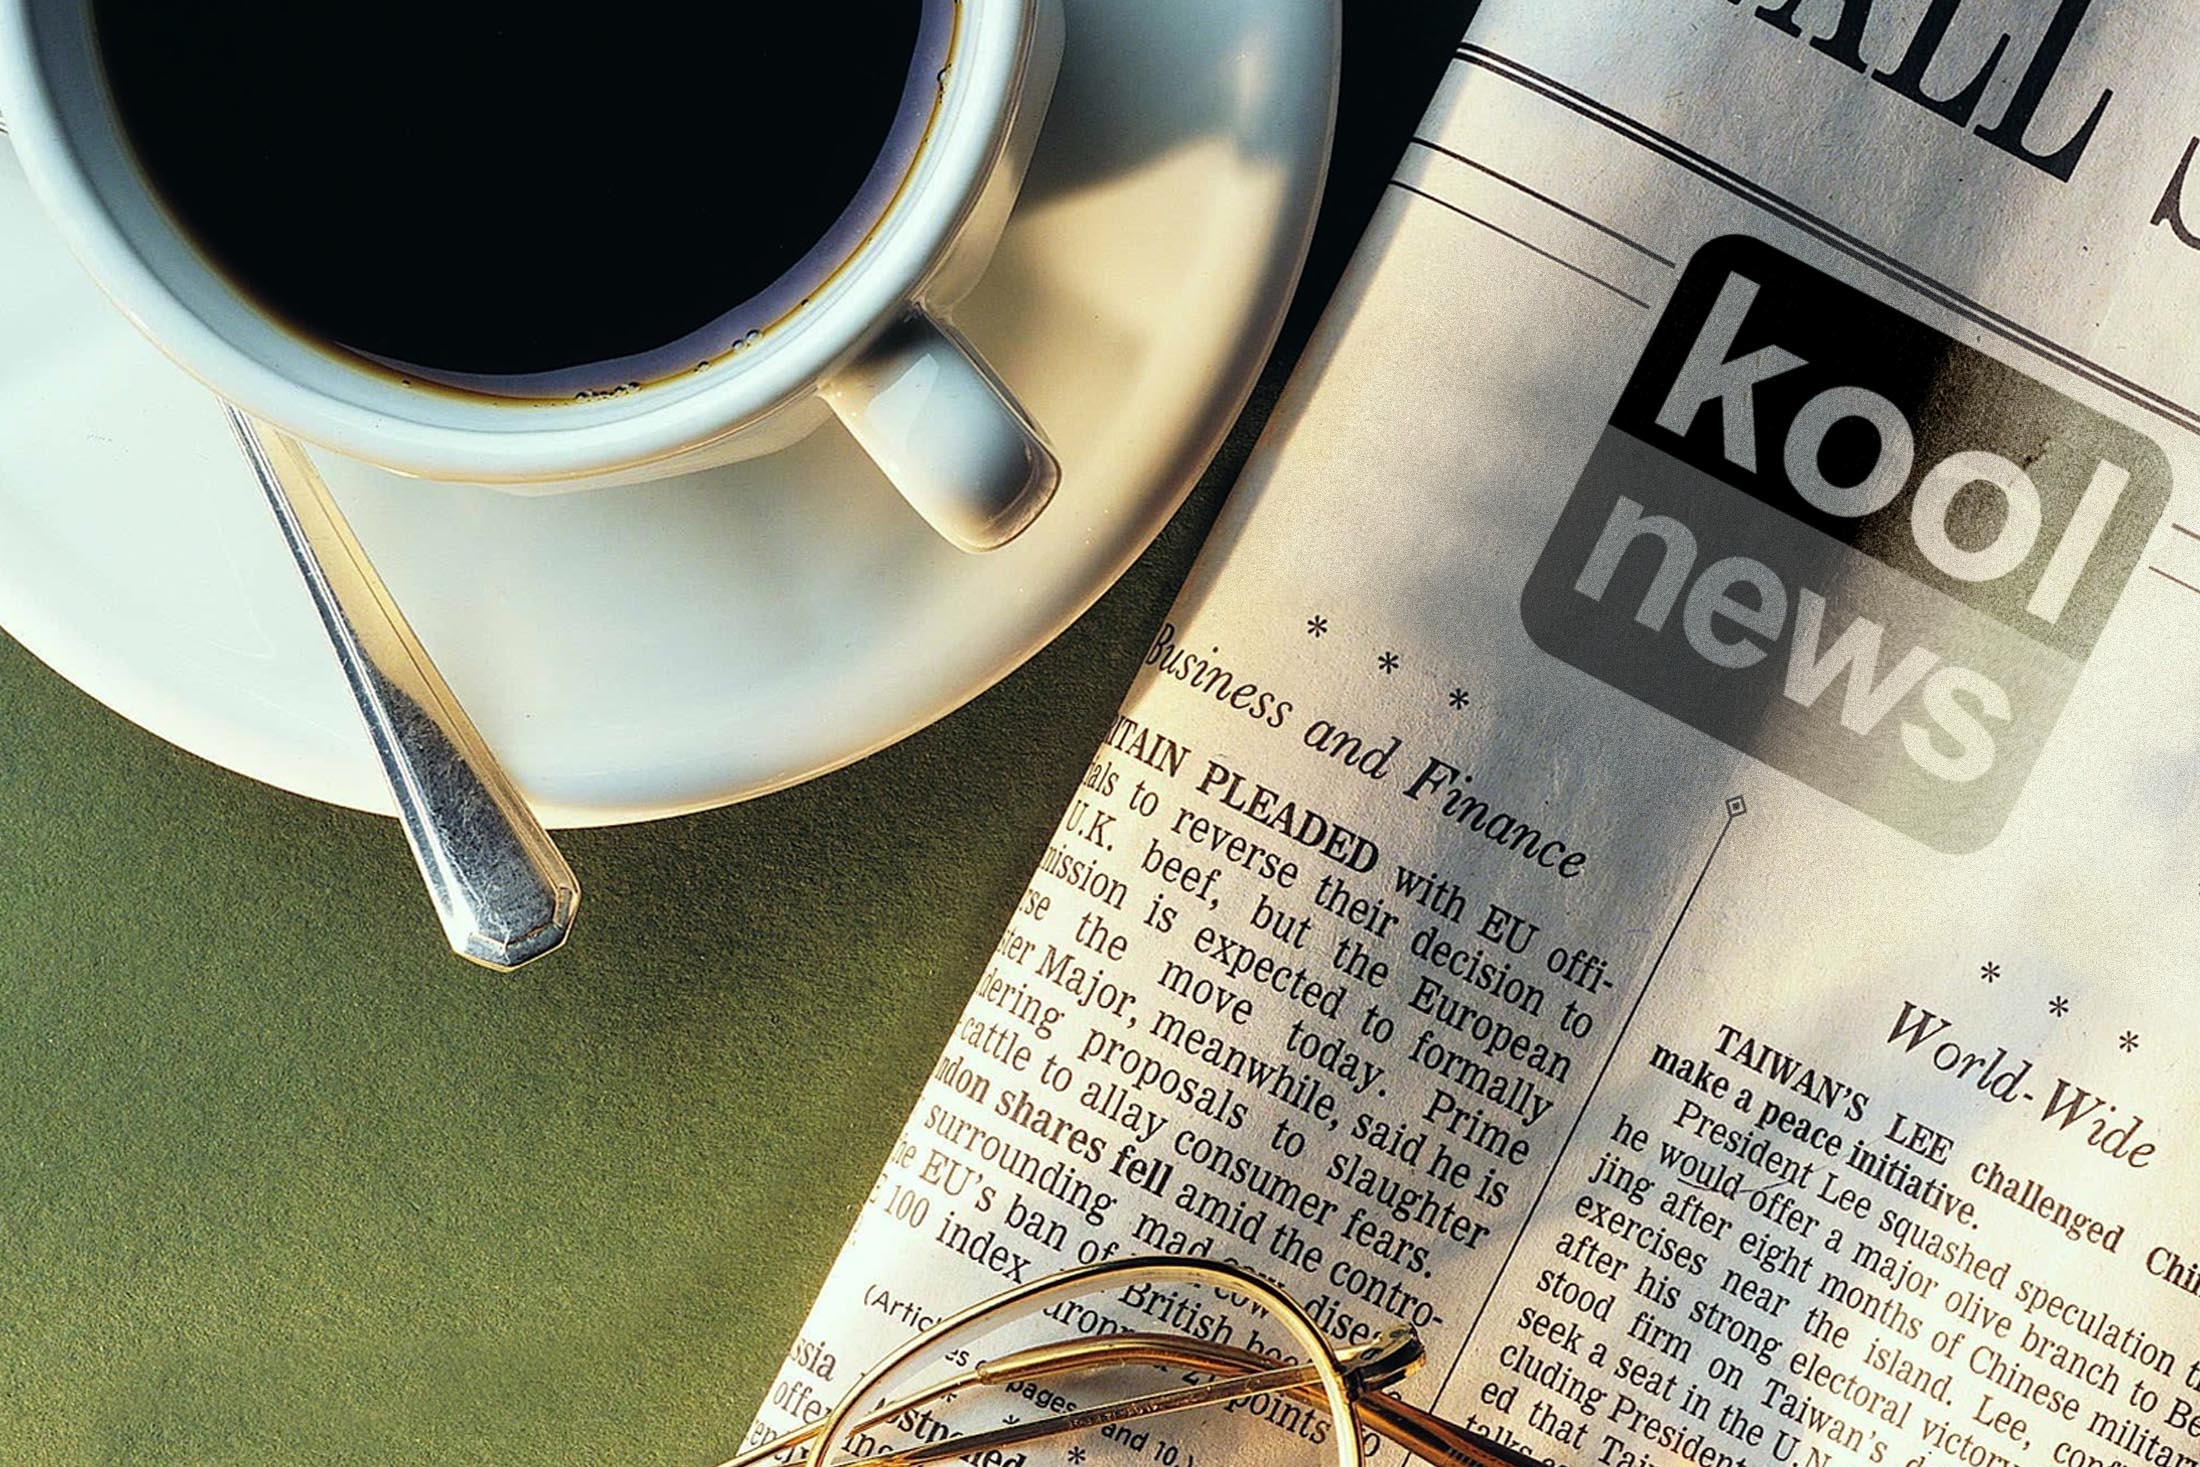 "<a href=""http://www.koolnews.gr/"" target=""_blank"">Koolnews.gr</a>"